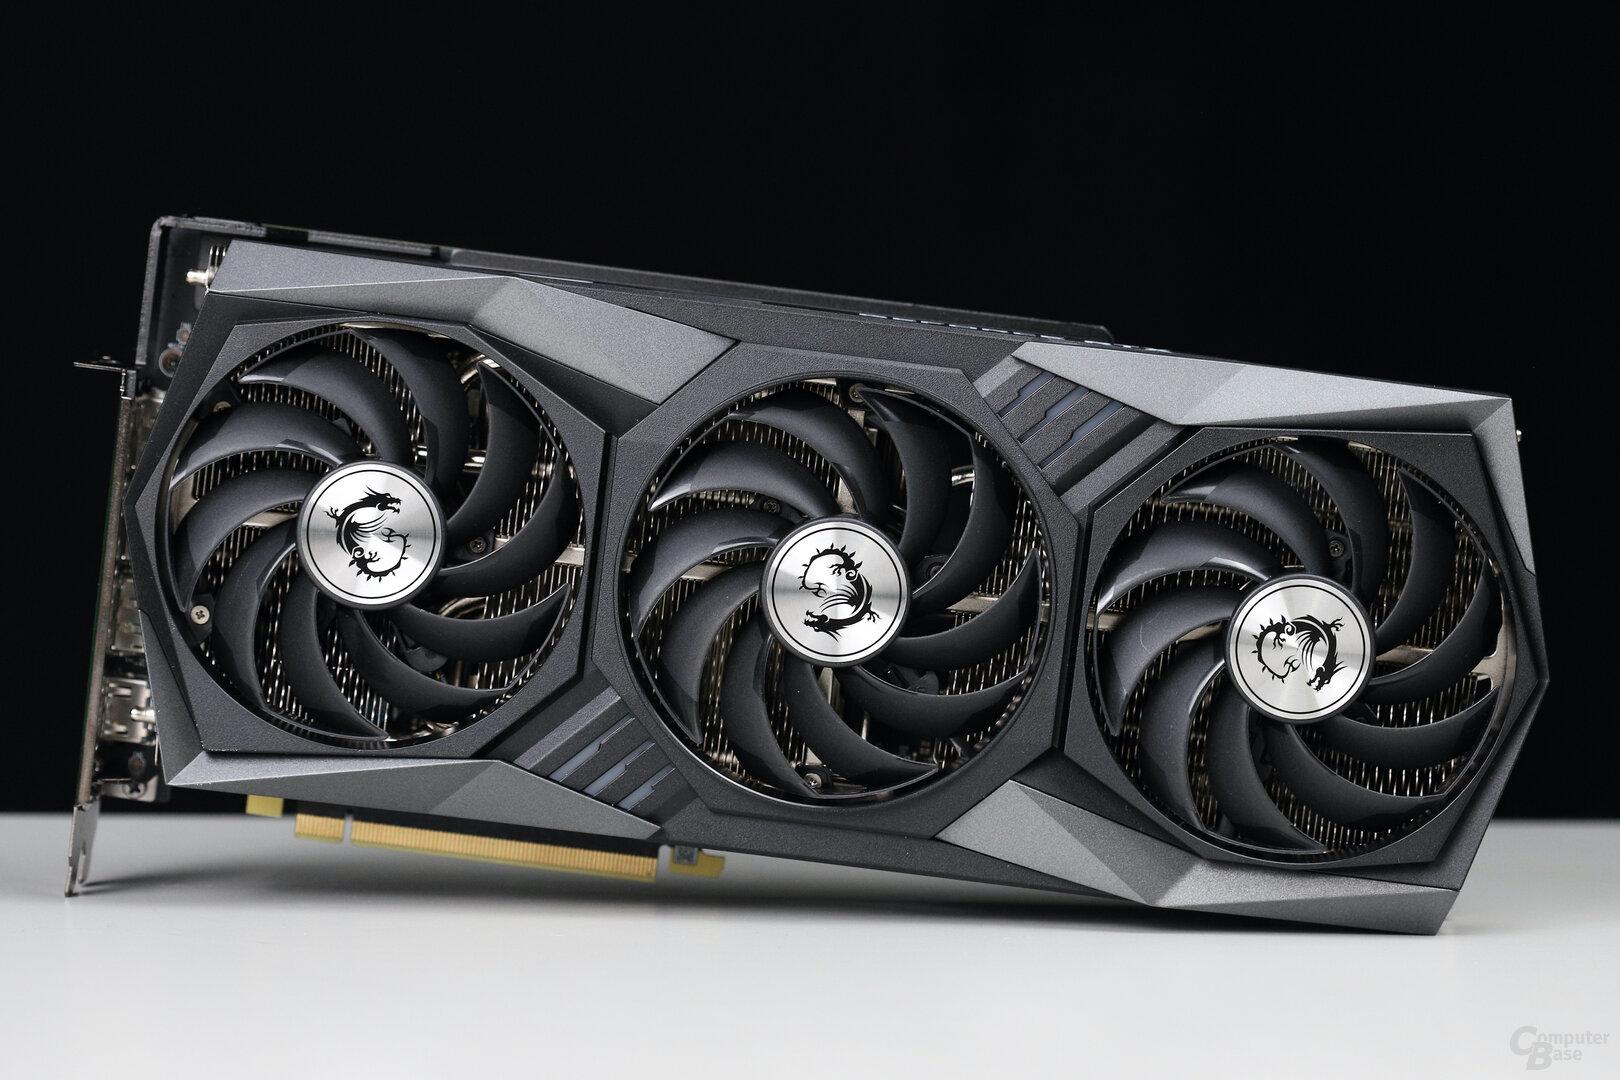 MSI GeForce RTX 3060 Ti Gaming X im Test im Test